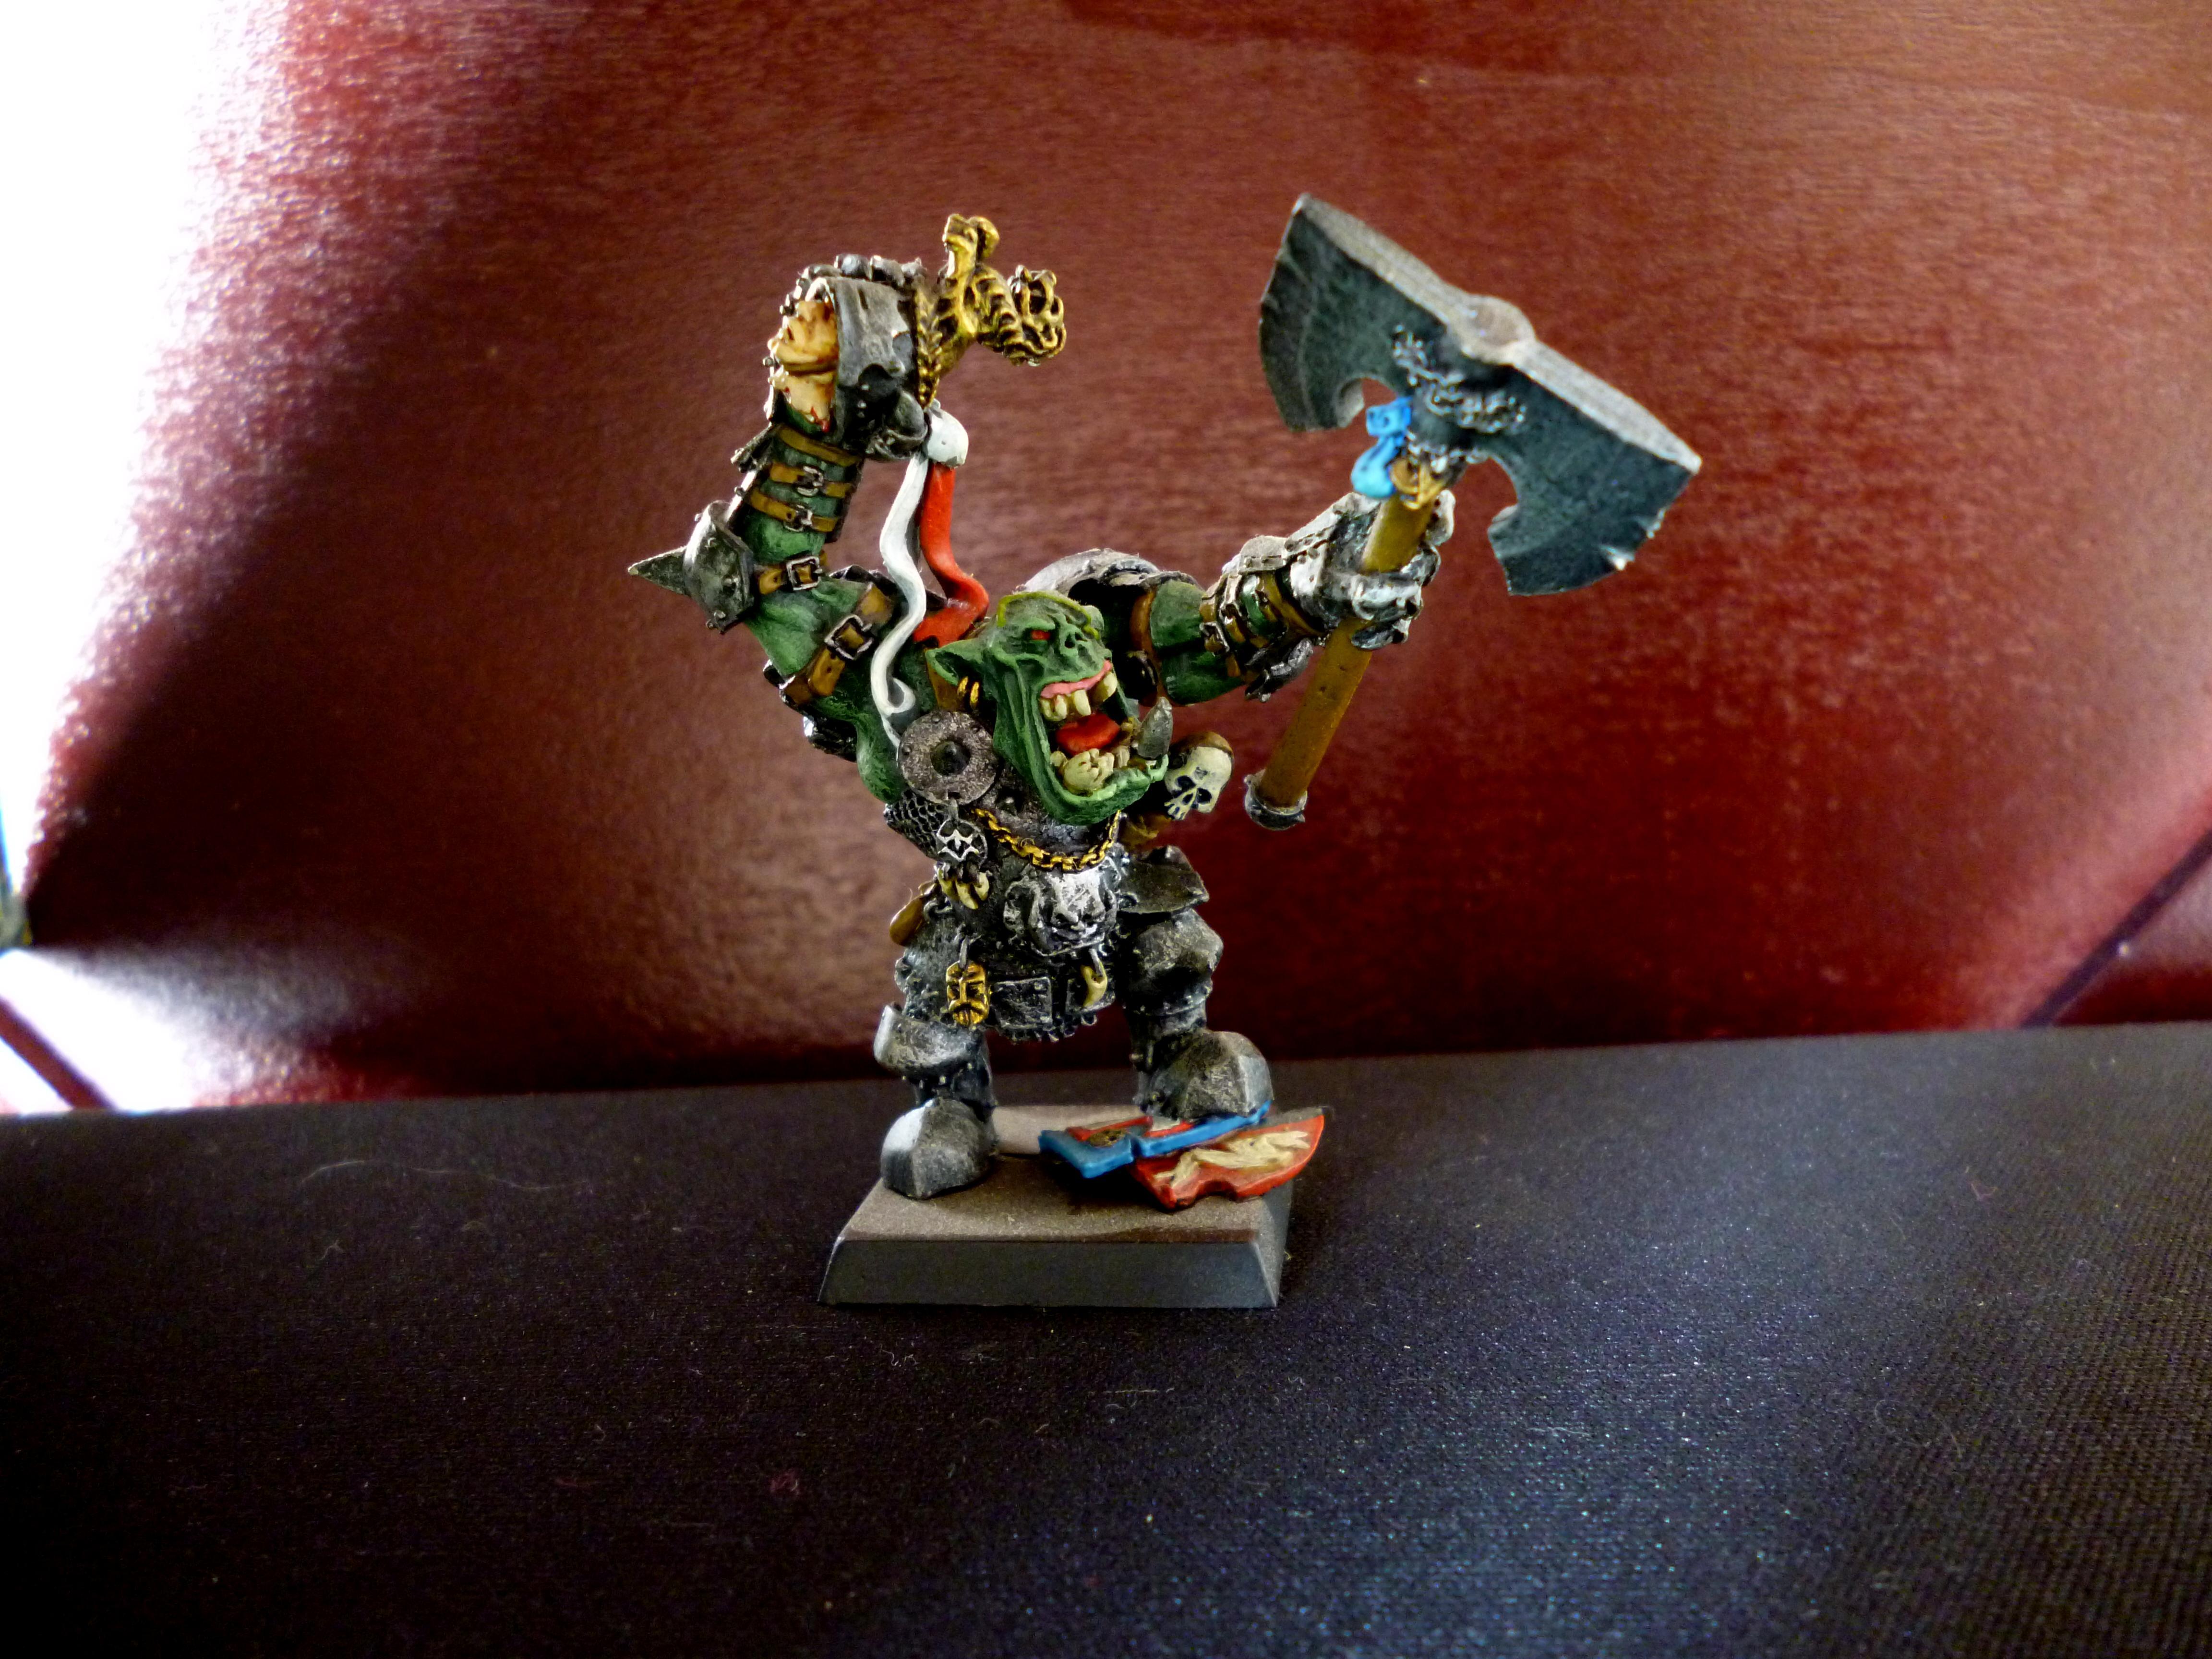 Goblins, Greenskins, Grimgor Ironhide, Grobi, Orcs